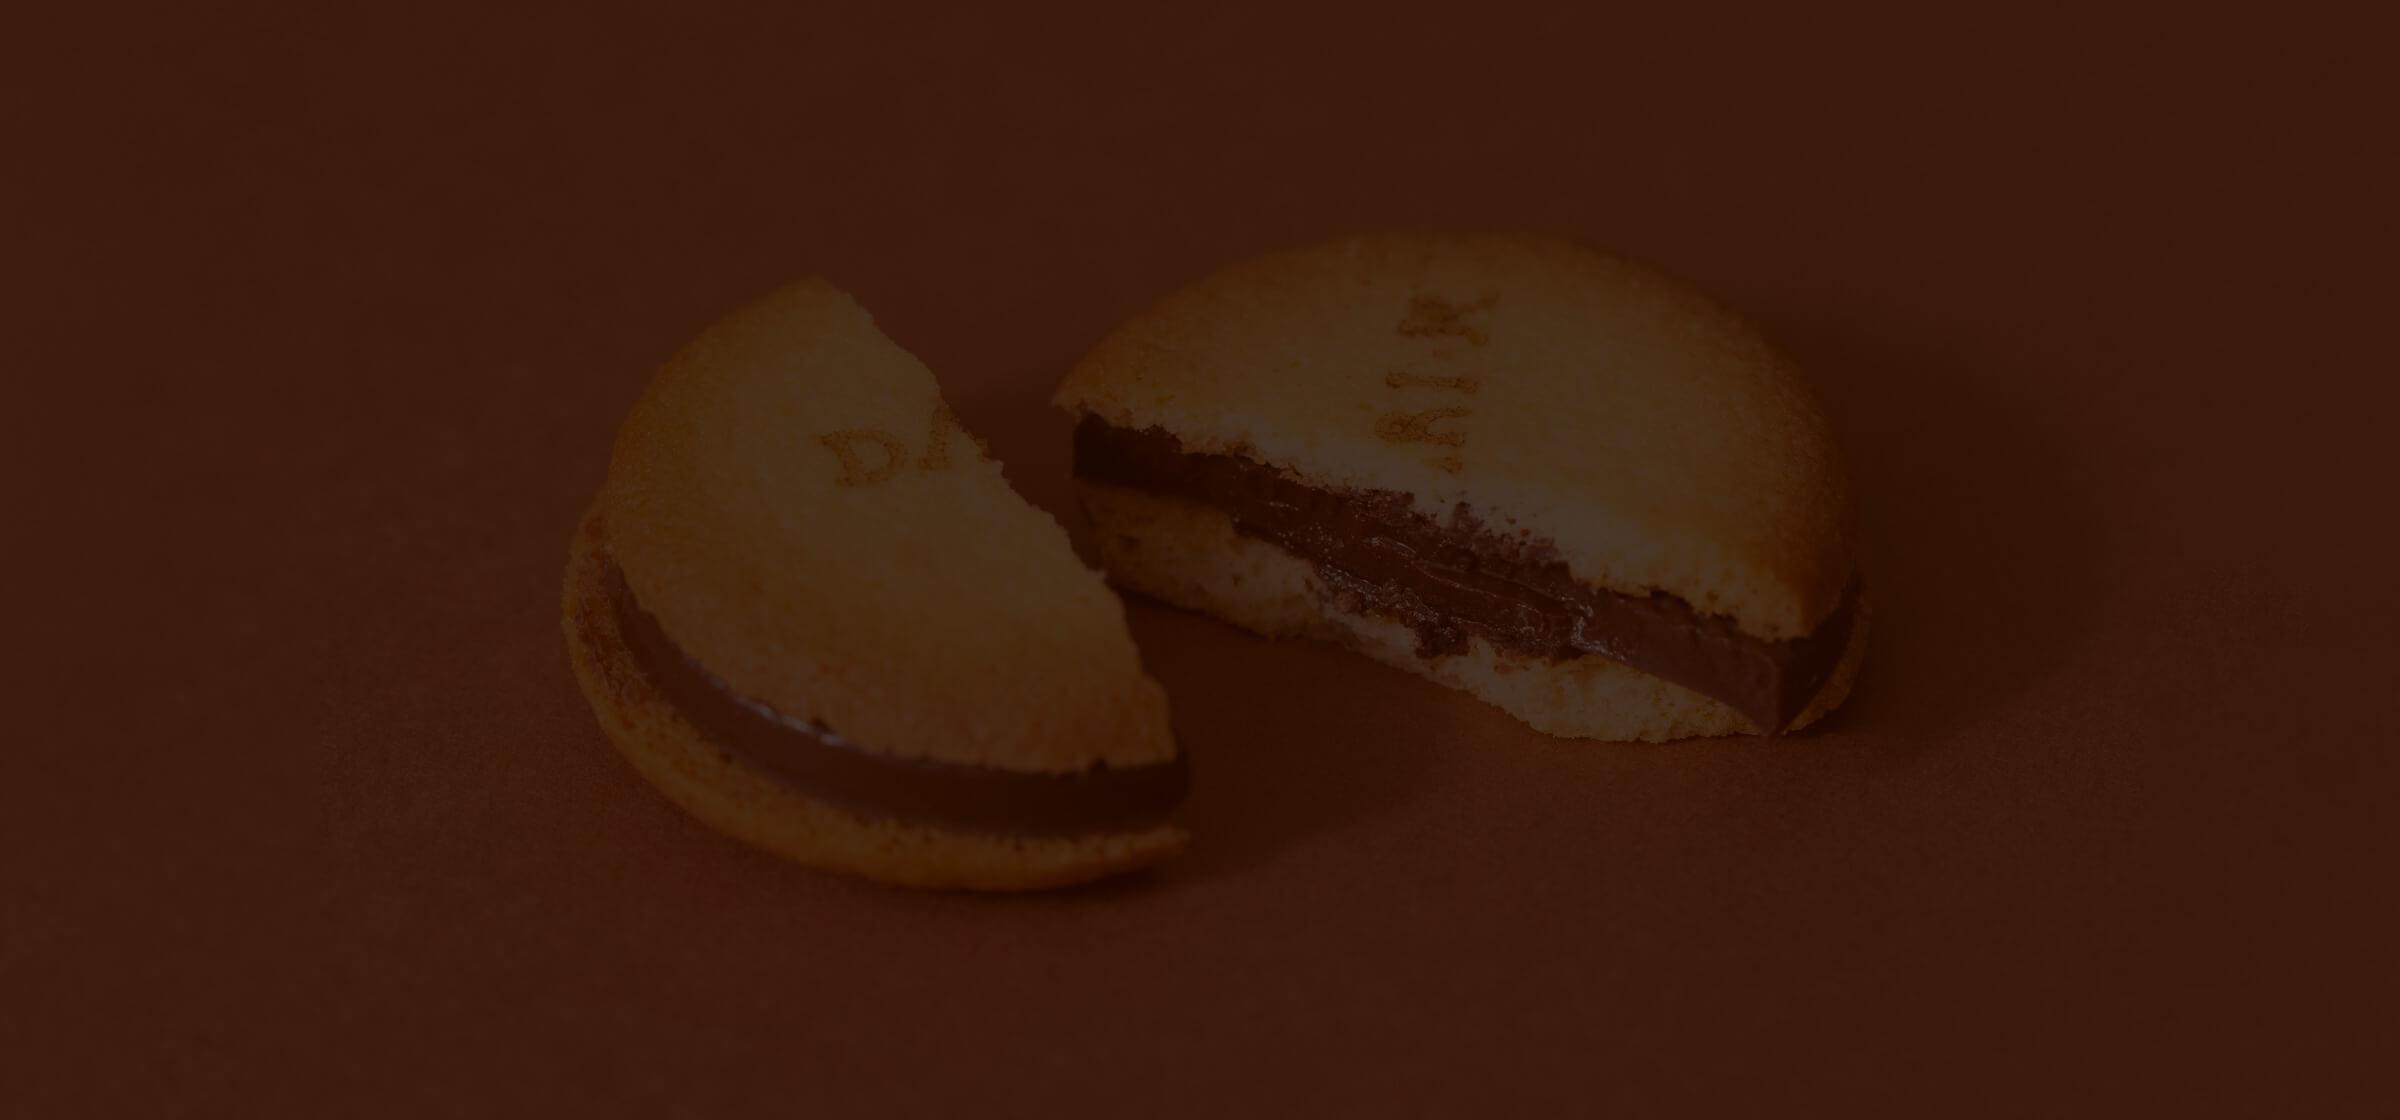 Dari K(ダリケー)の定番の商品「カカオサンドクッキー」